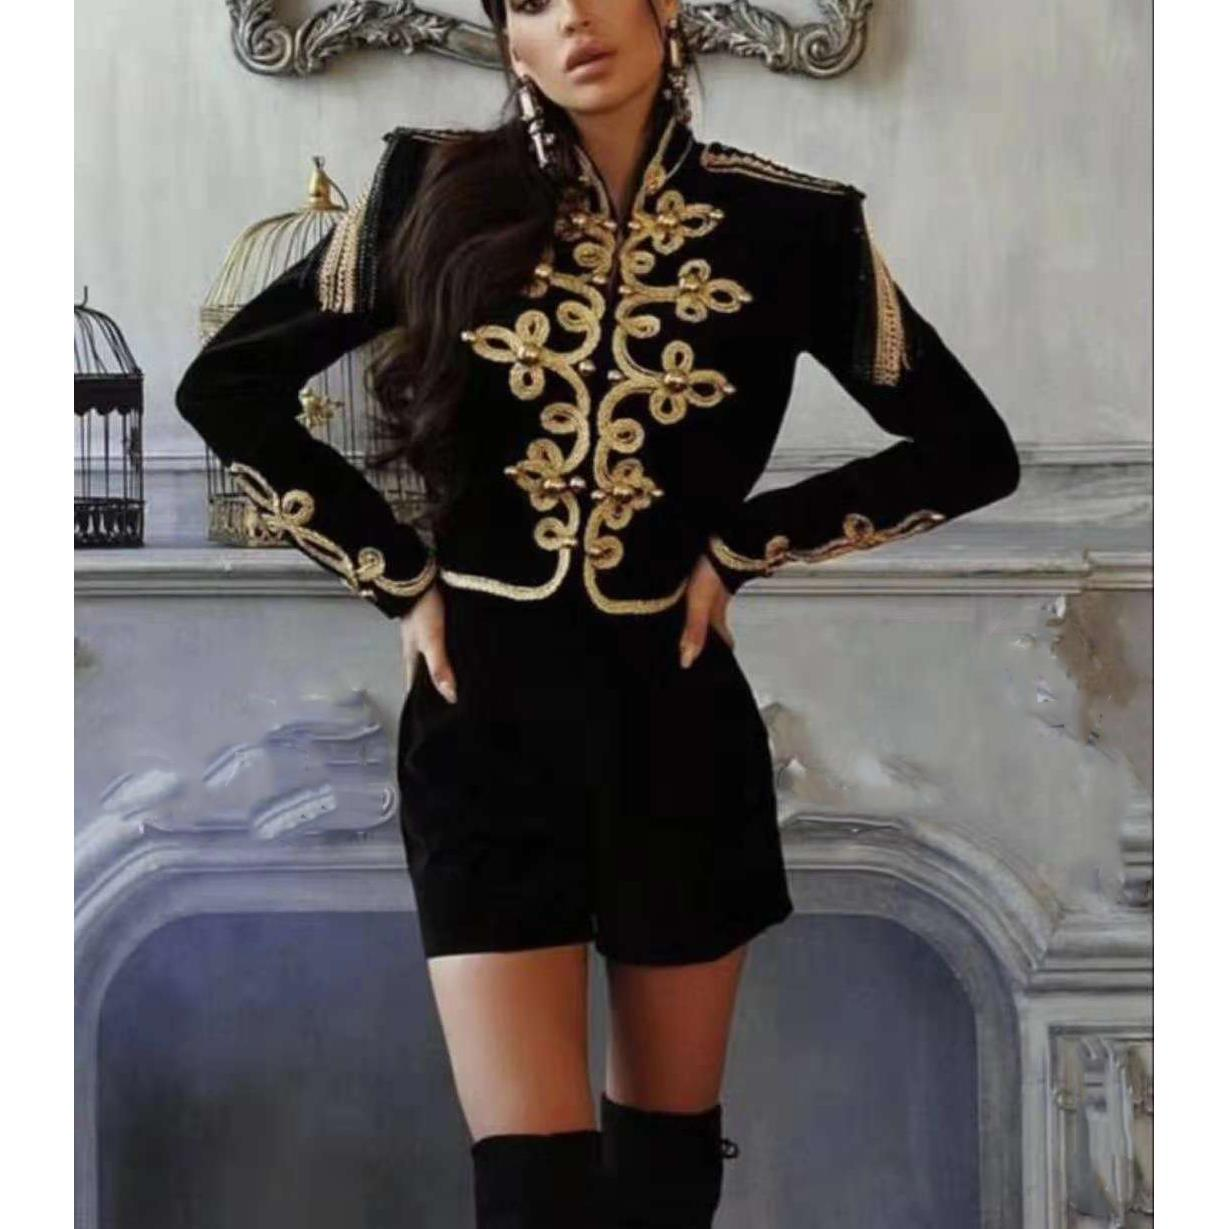 Chaqueta corta Retro mujer ropa Empire 2019 Otoño Invierno Lady Jacket Coat - 2